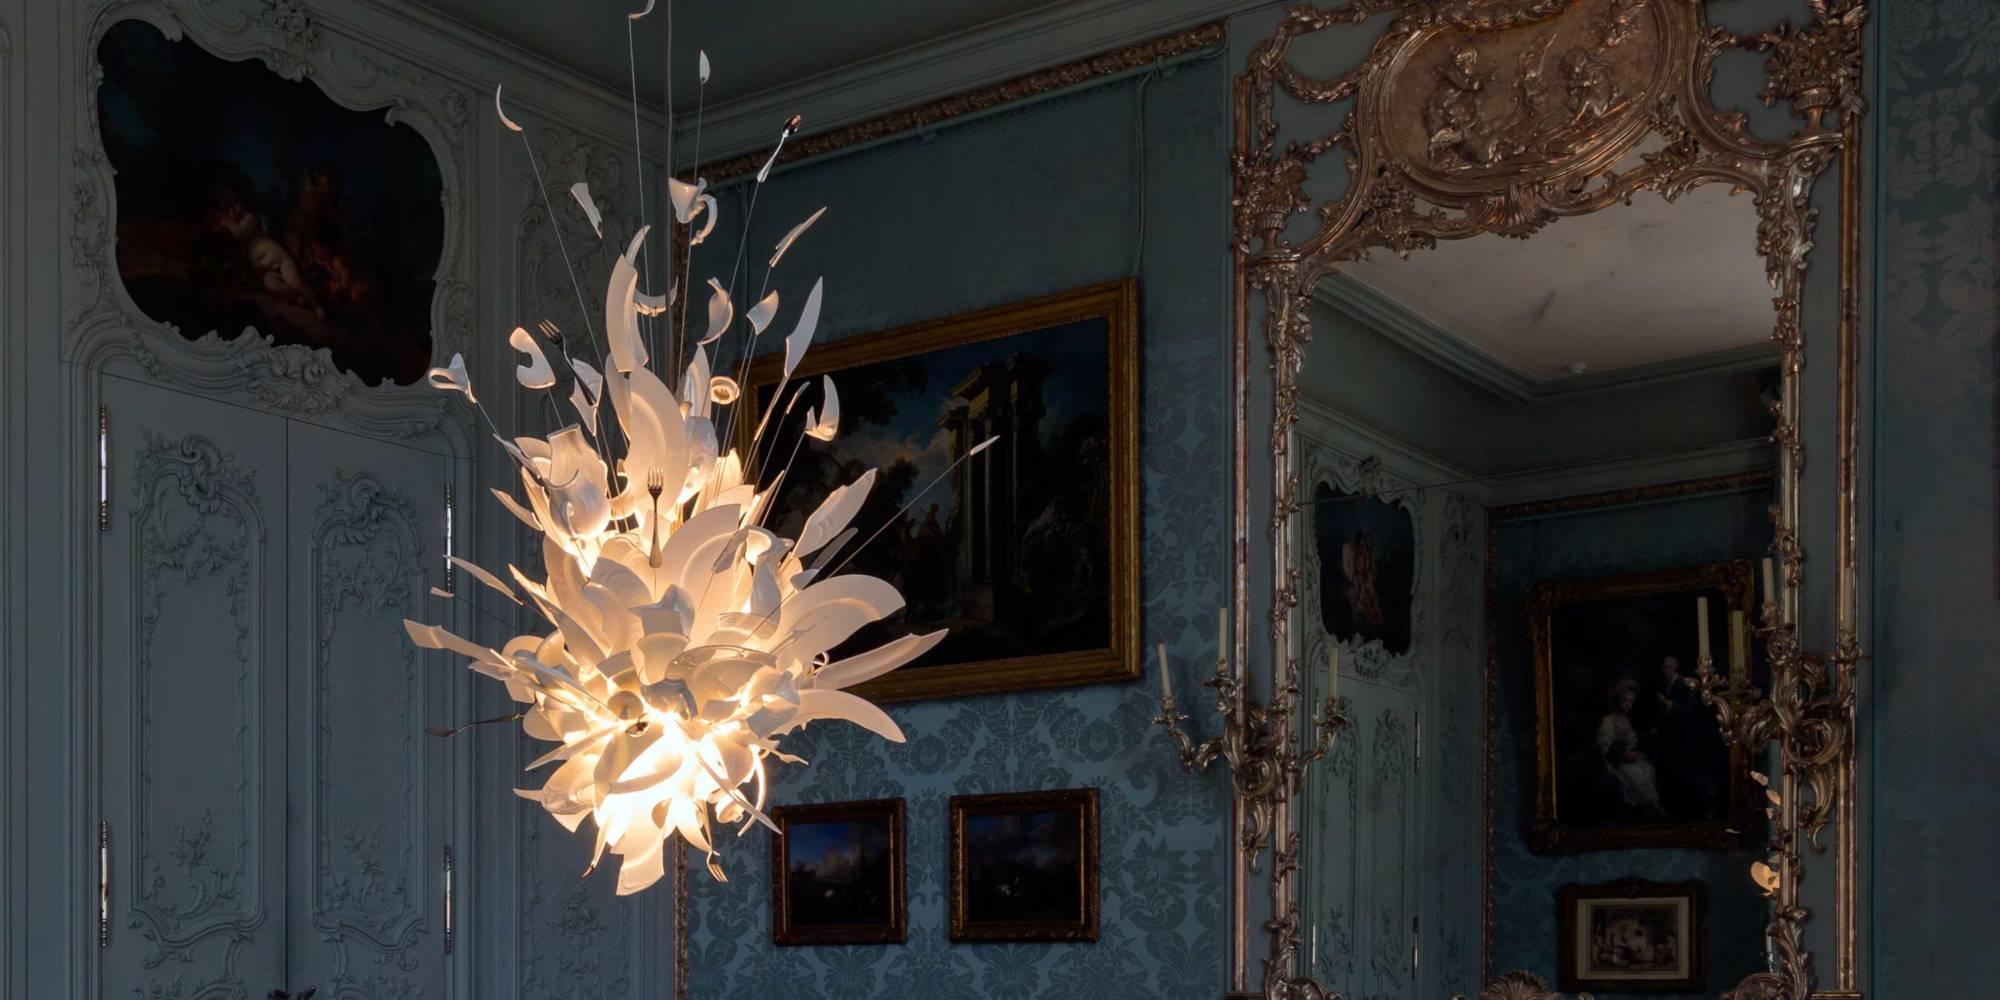 The Blue Room, Waddesdon Manor